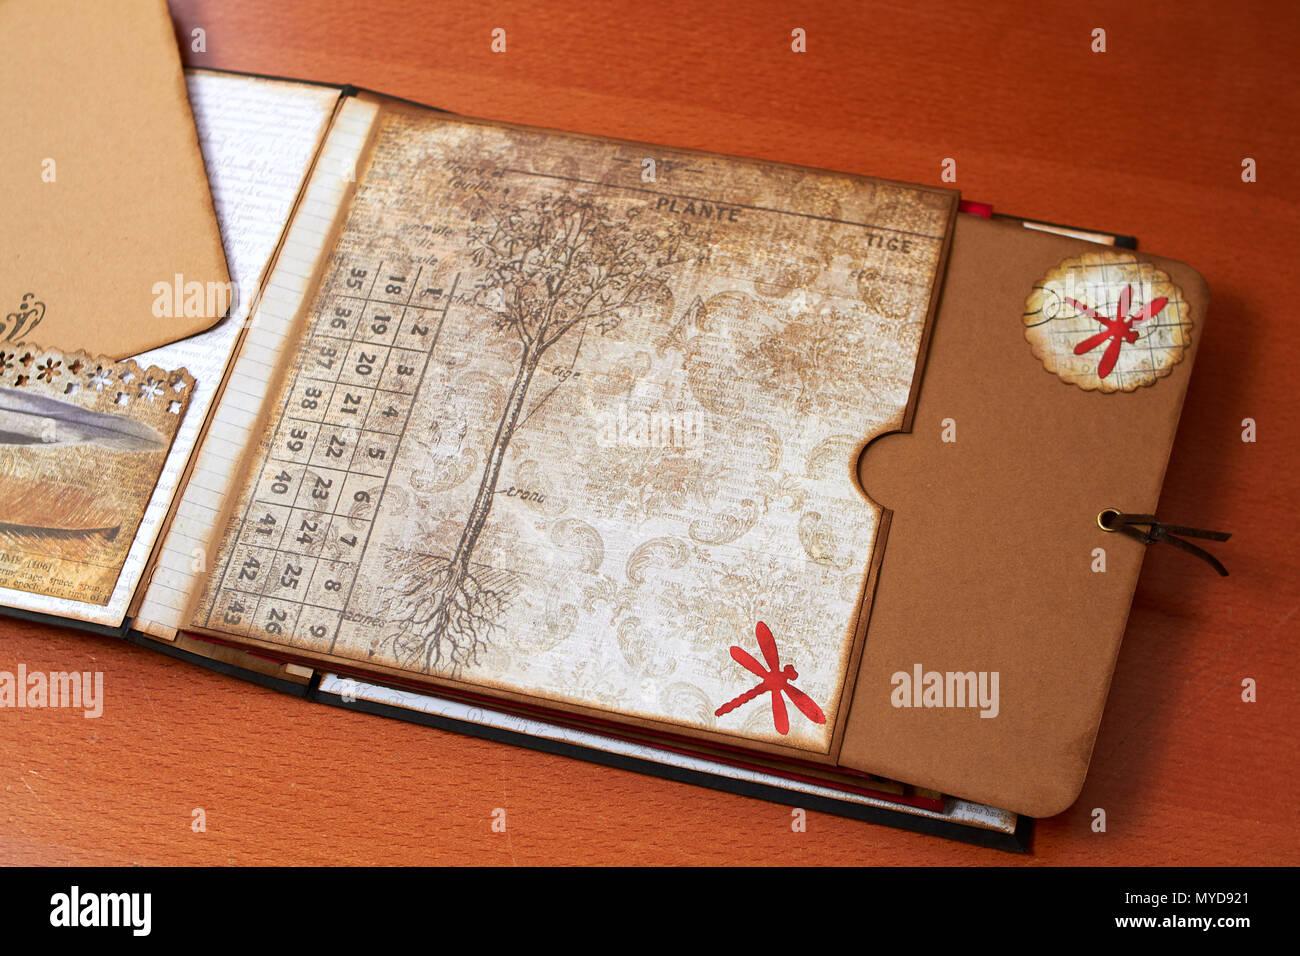 Scapbook empty album with textured paper Stock Photo